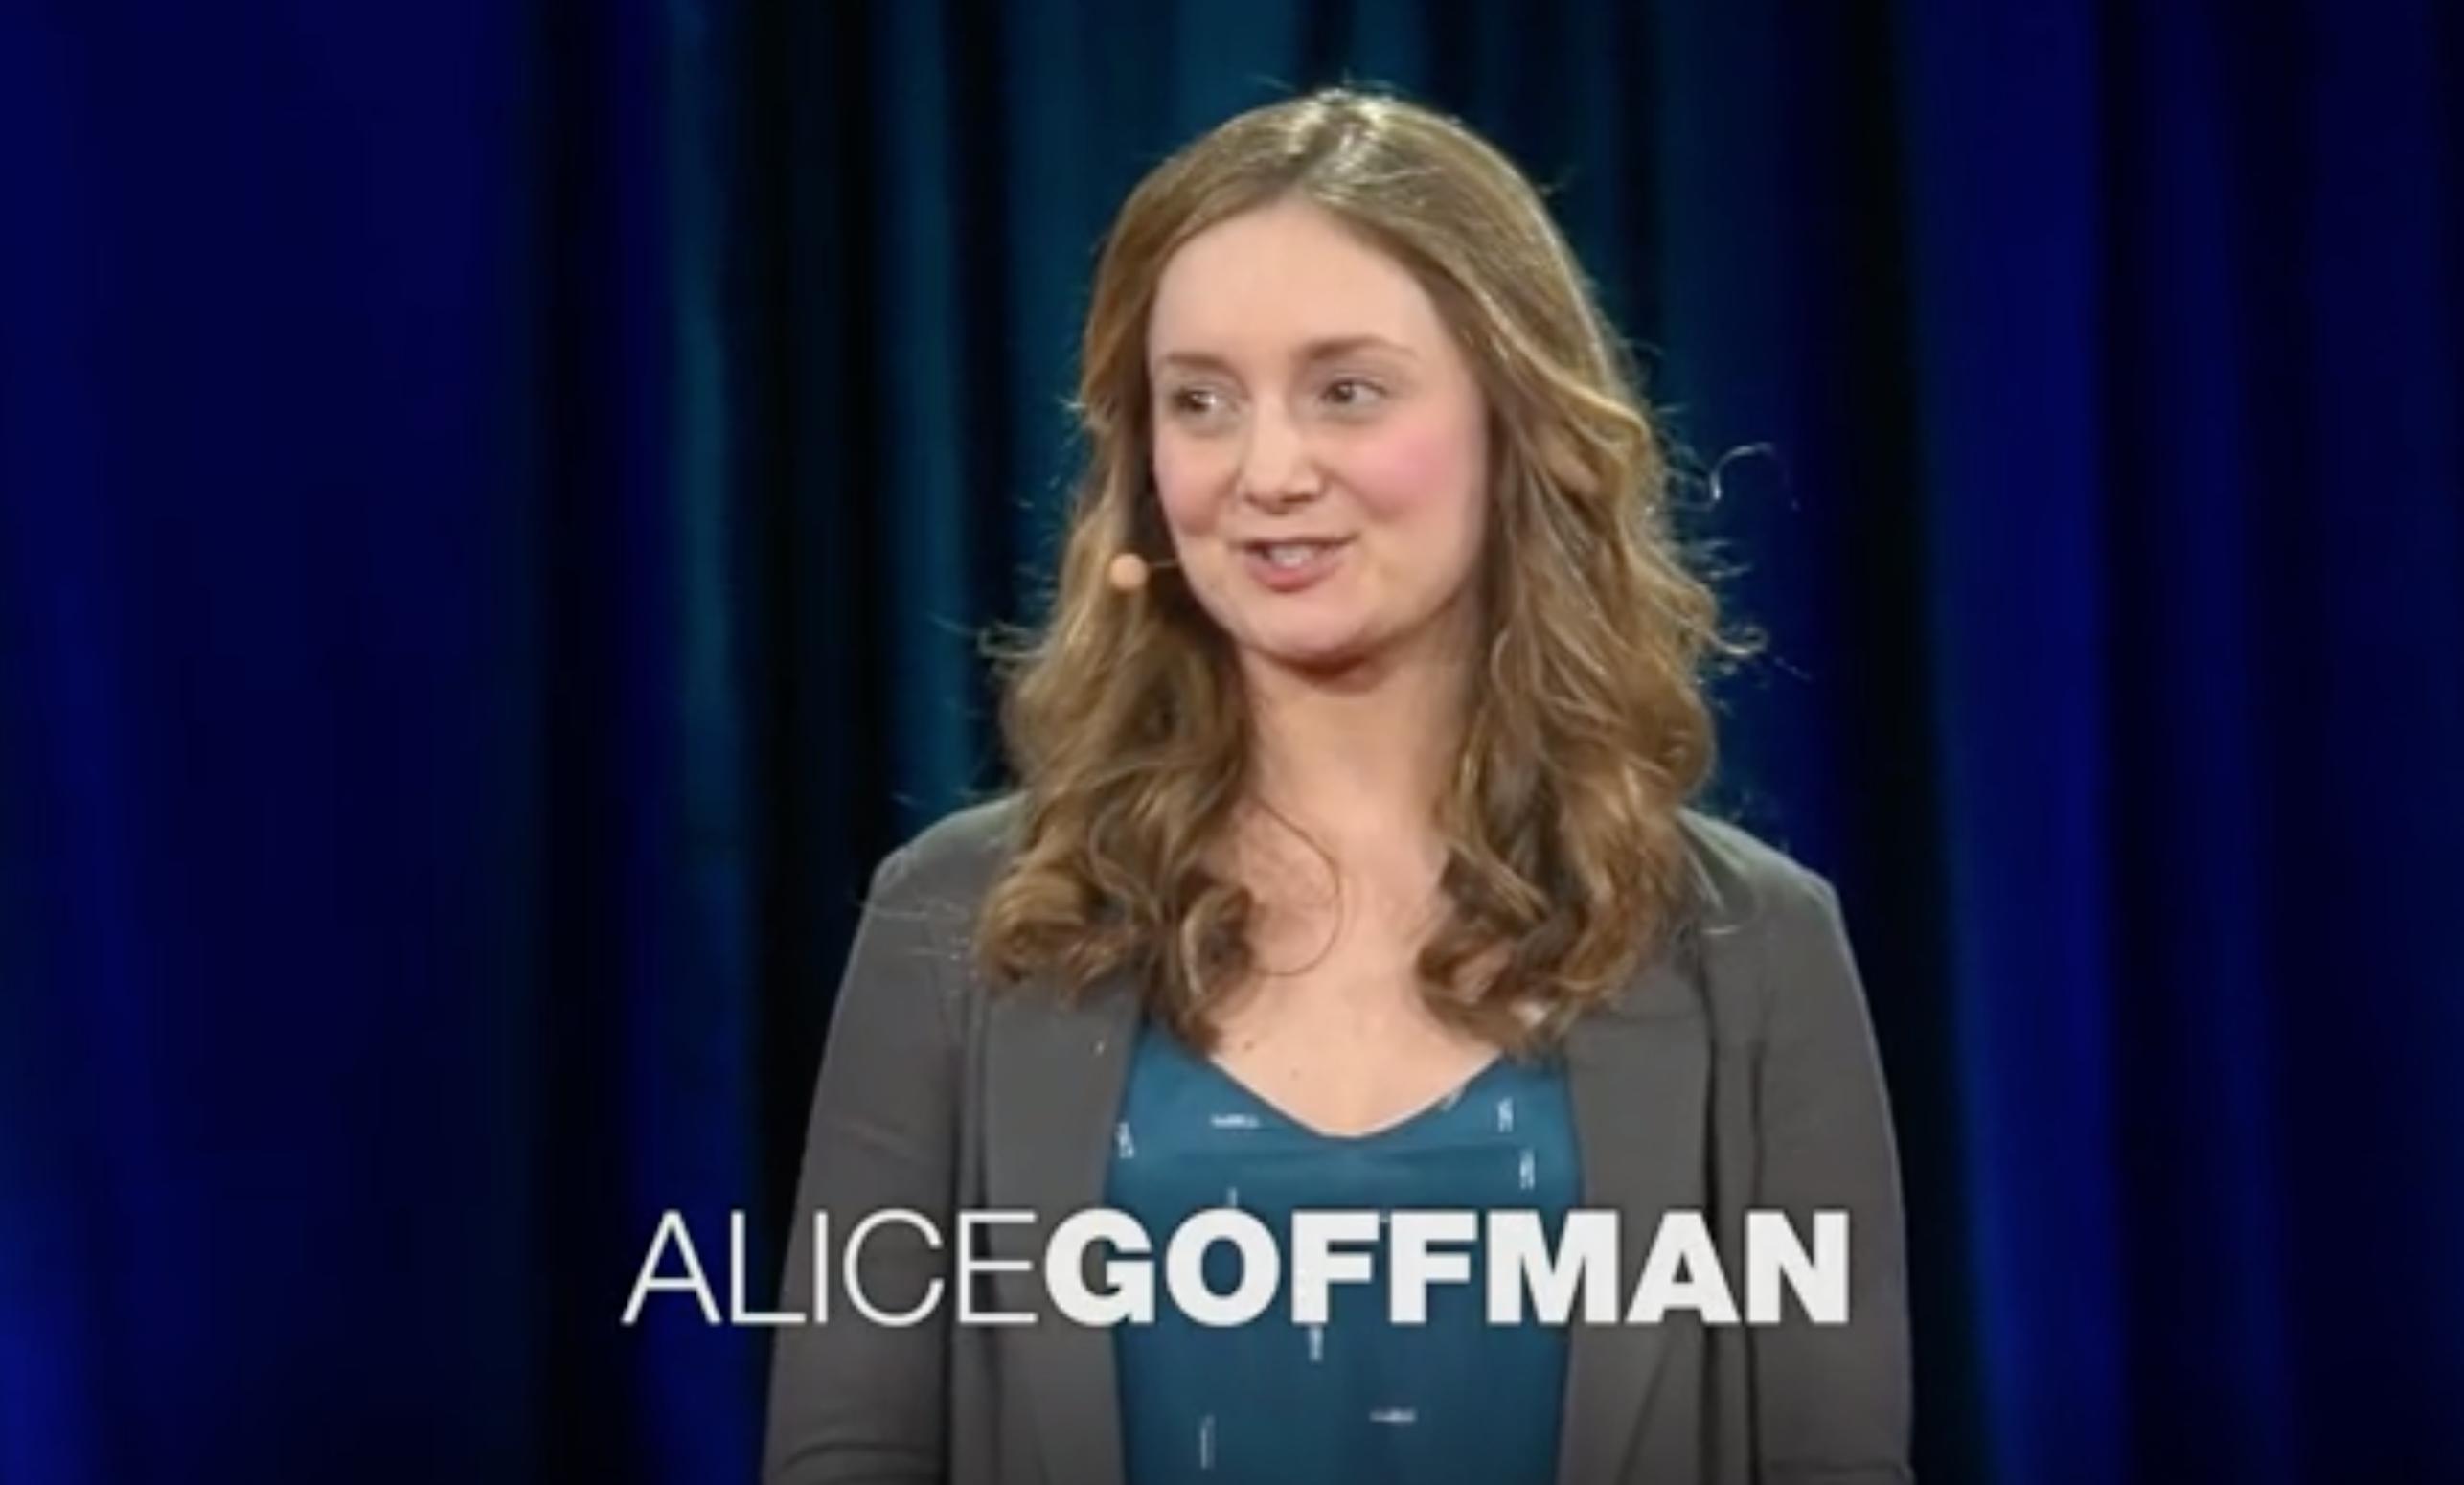 Alice Goffman